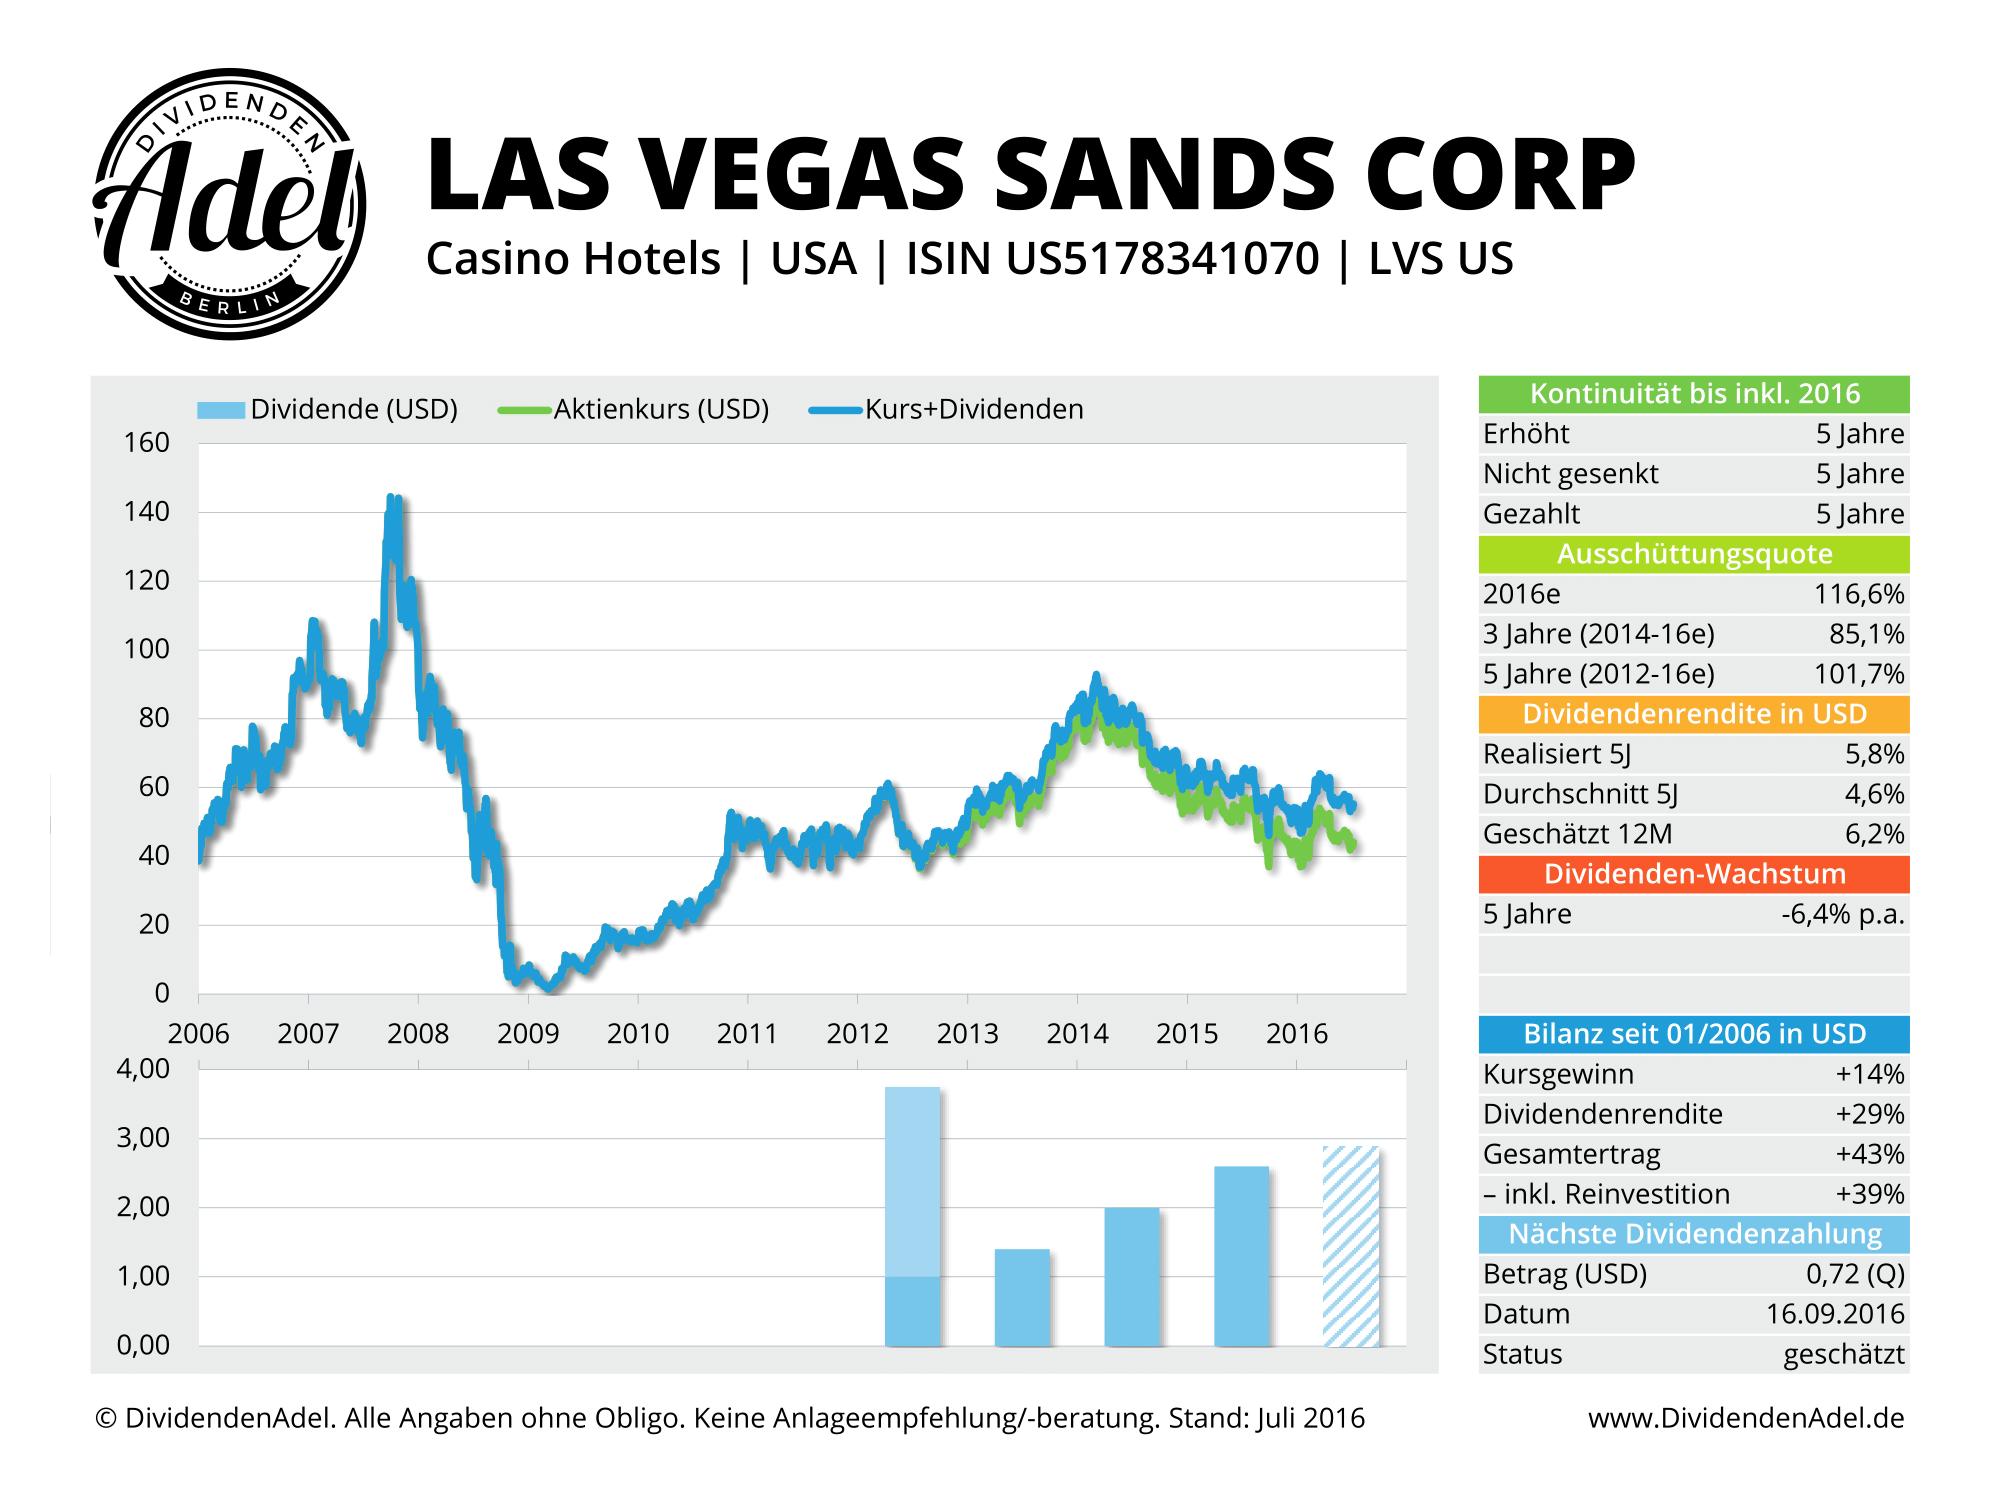 Dividendenprofil Casino-Aktien Las Vegas Sands